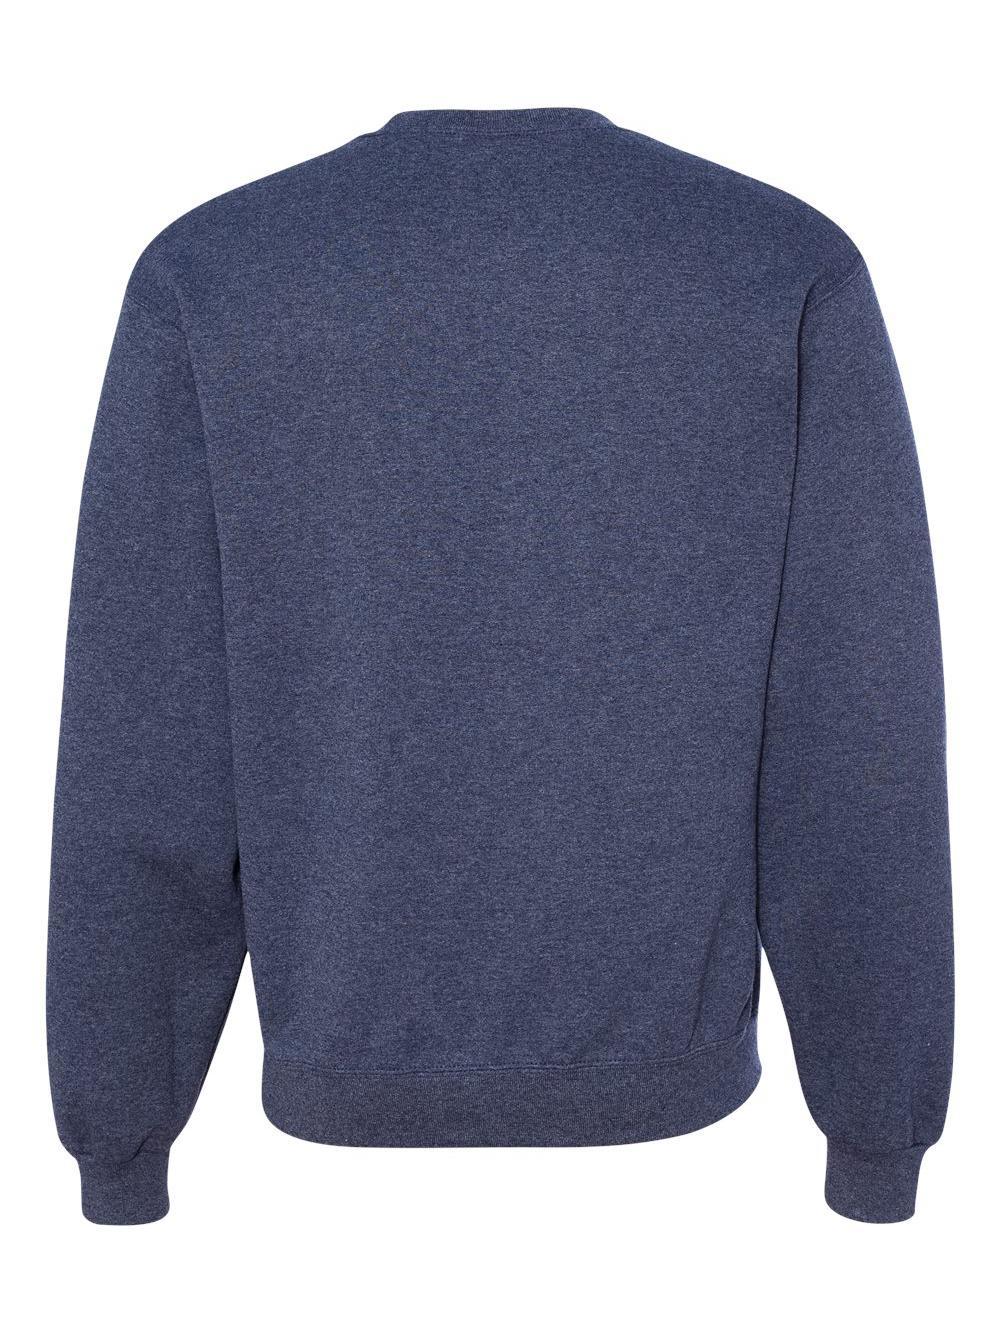 Jerzees-NuBlend-Crewneck-Sweatshirt-562MR thumbnail 97